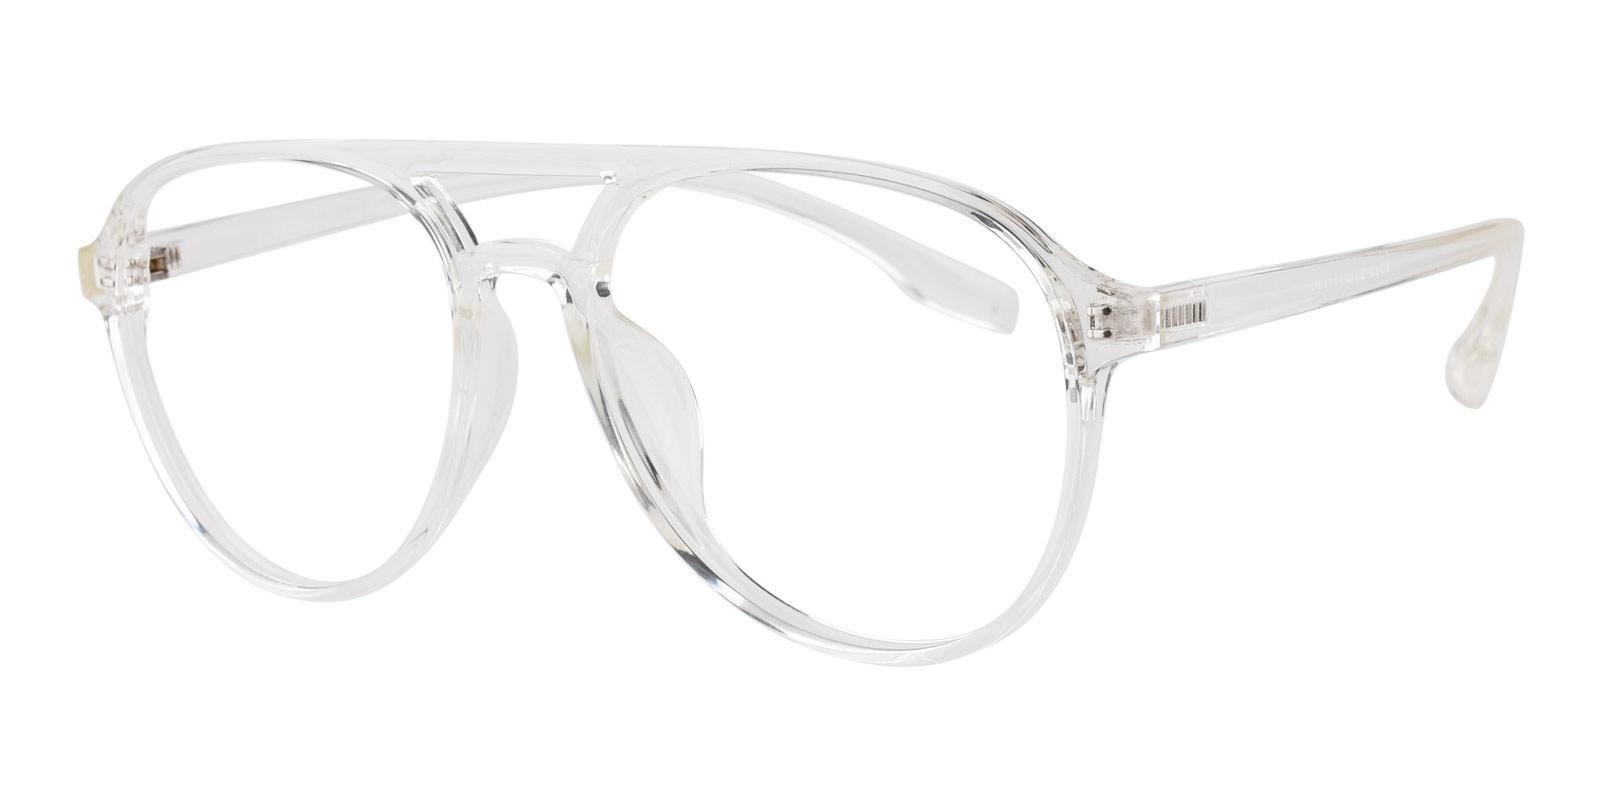 Mitchell-Translucent-Aviator-TR-Eyeglasses-detail